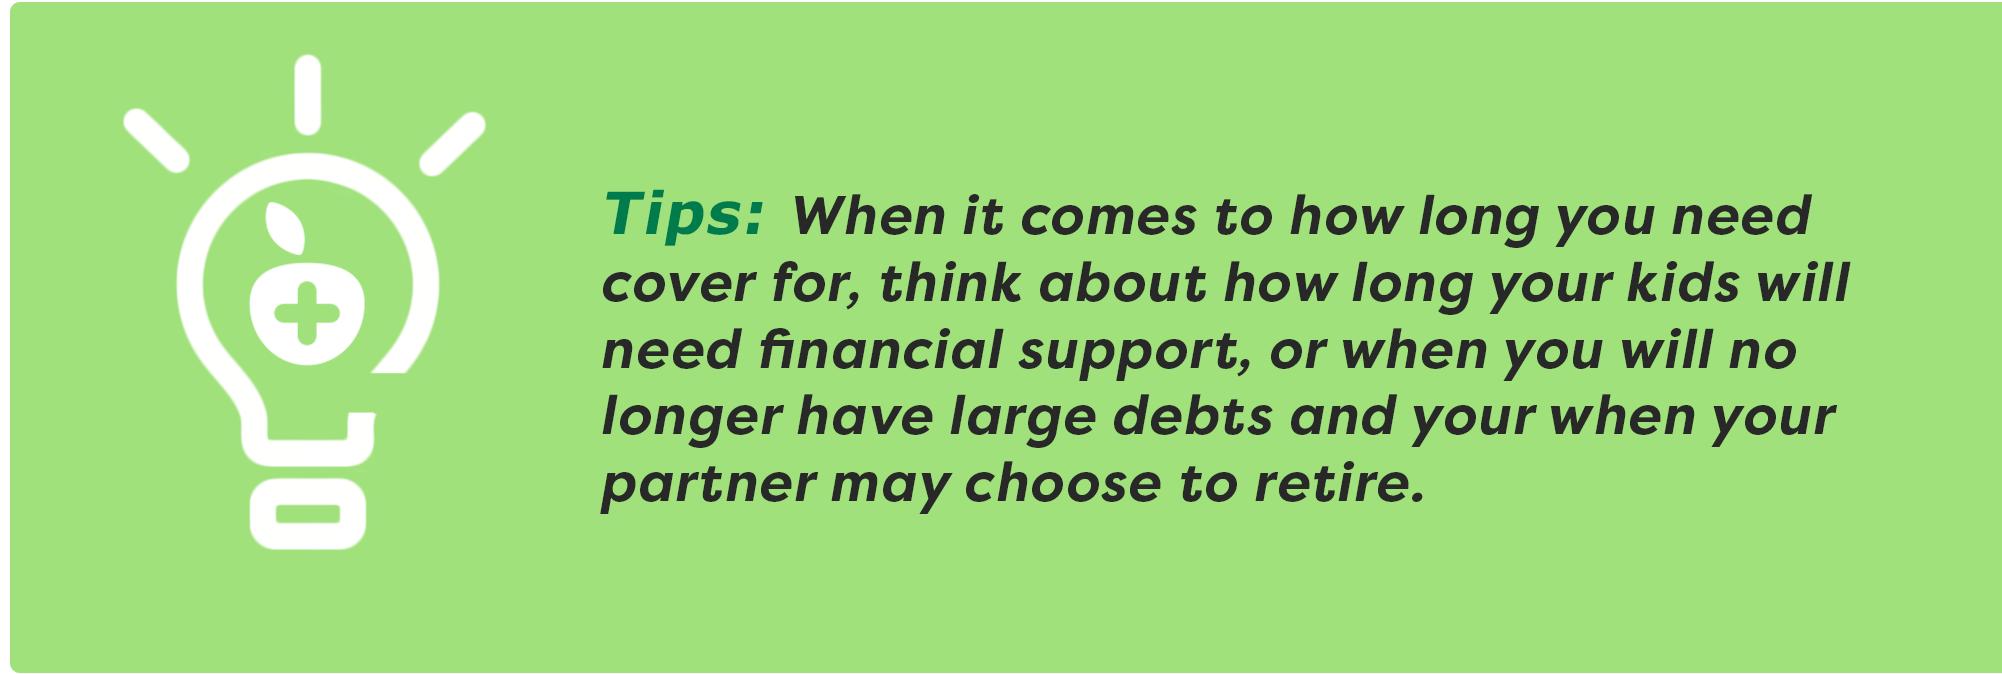 life insurance tip 2